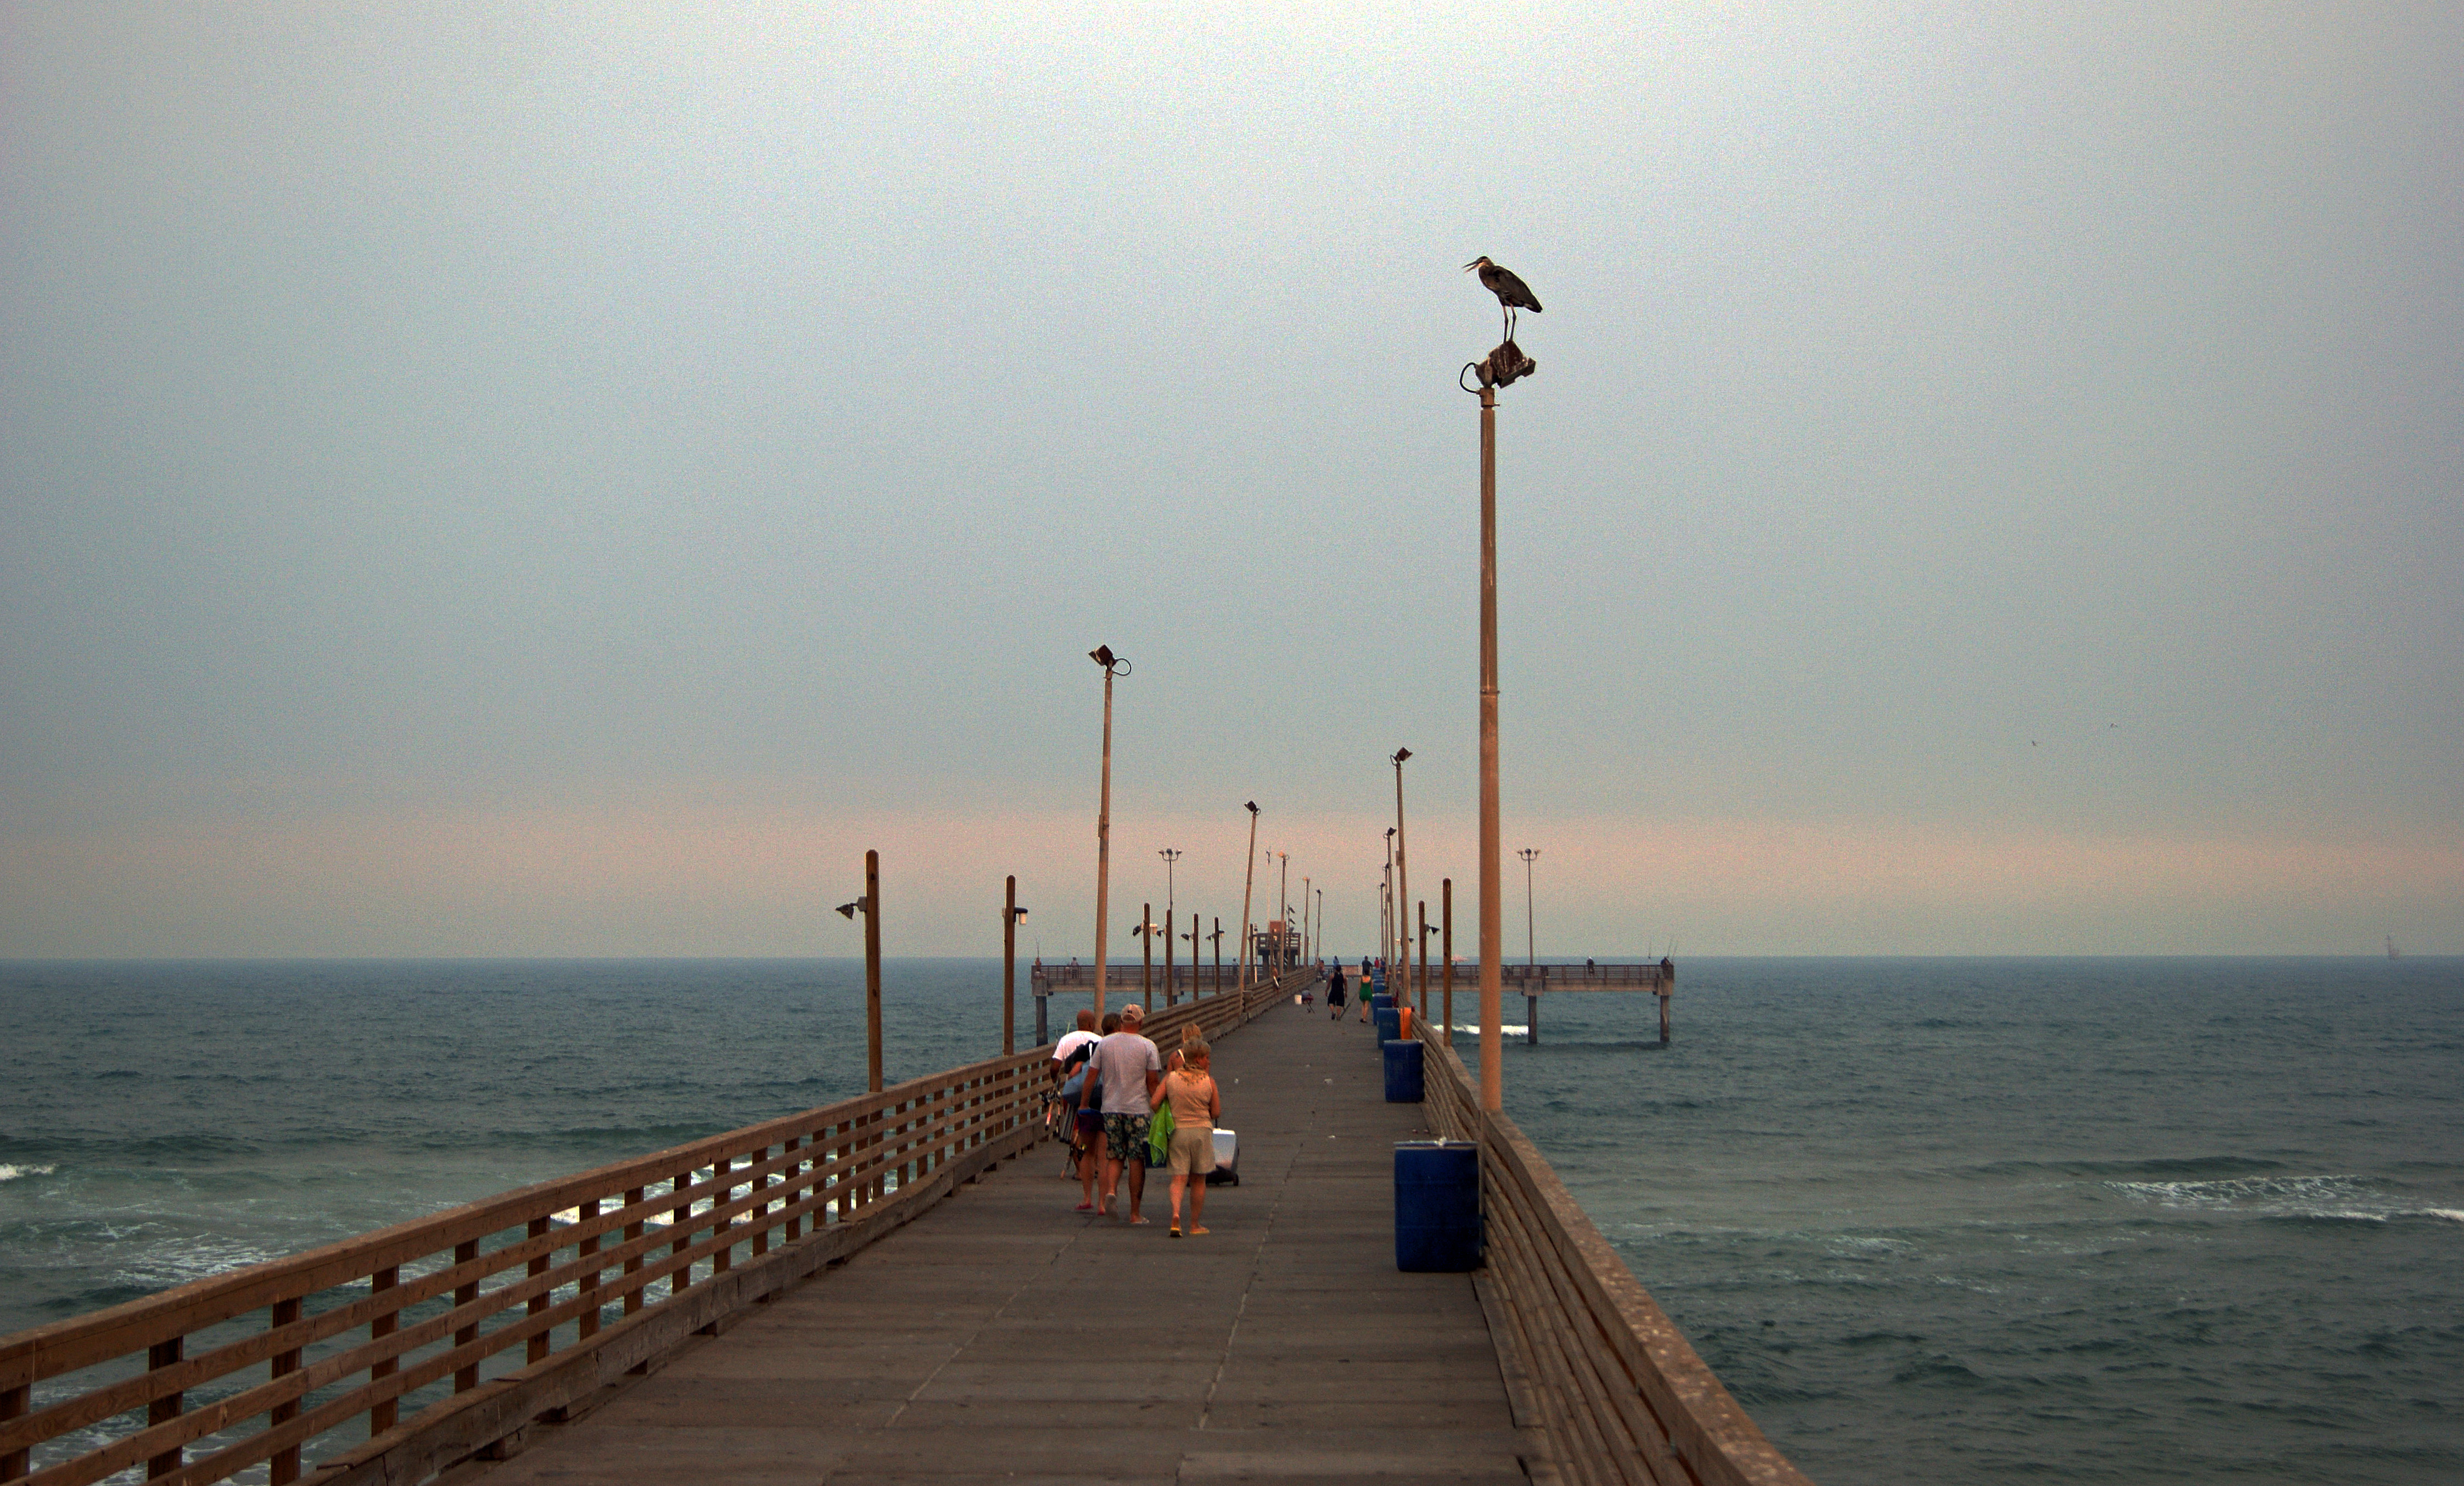 Padre bali park corpus christi texas beach fishing for Fishing in corpus christi texas